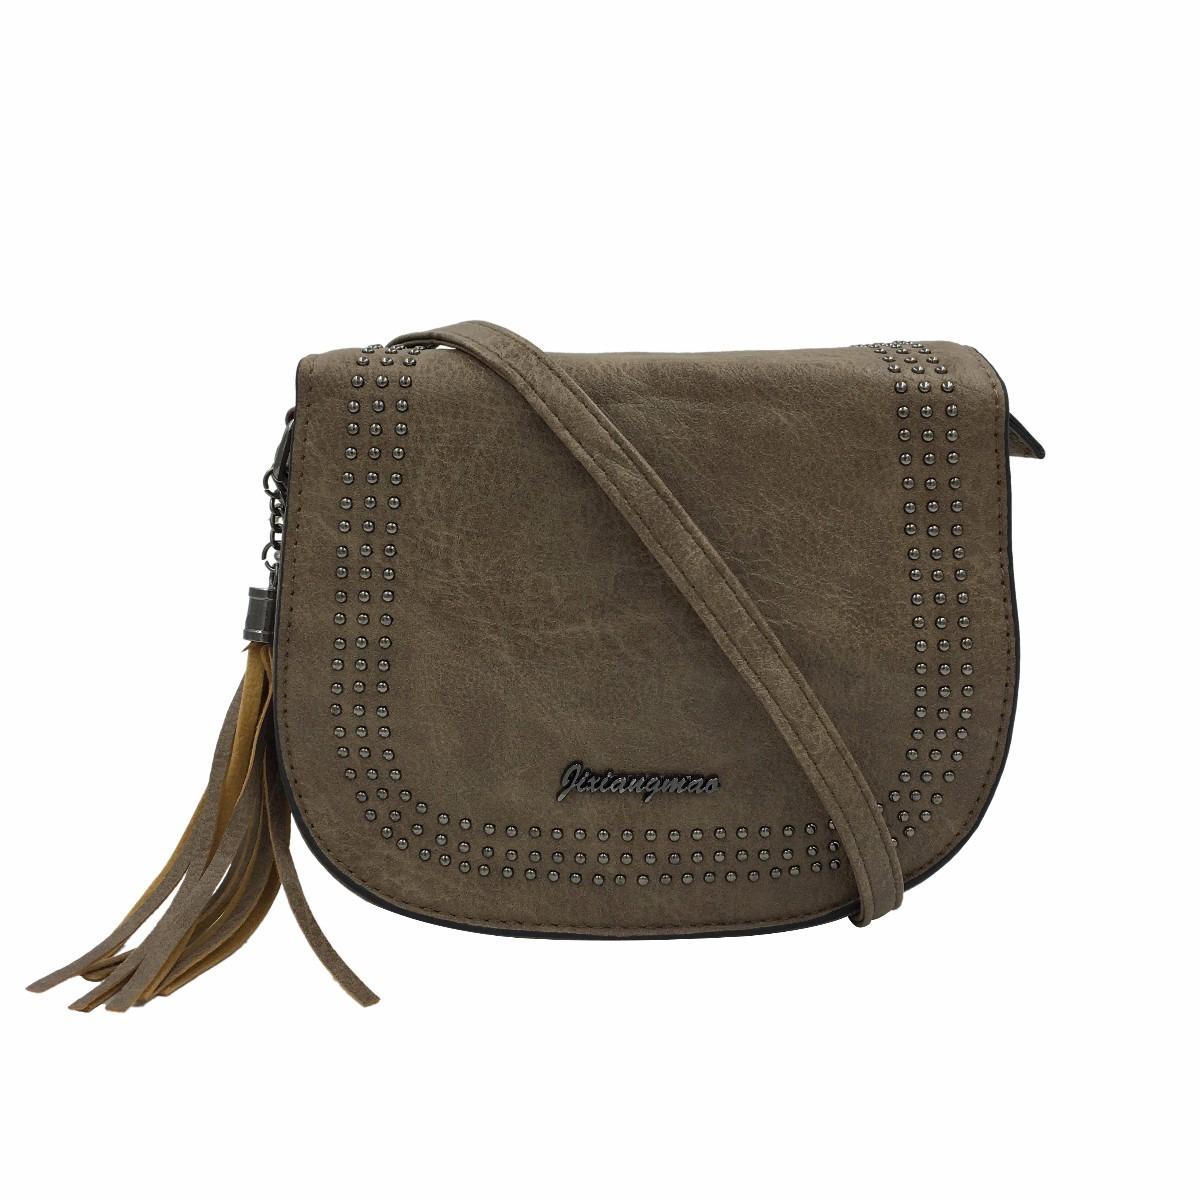 06c41f46d mini bolsa feminina pequena tiracolo transversal taxinha. Carregando zoom.